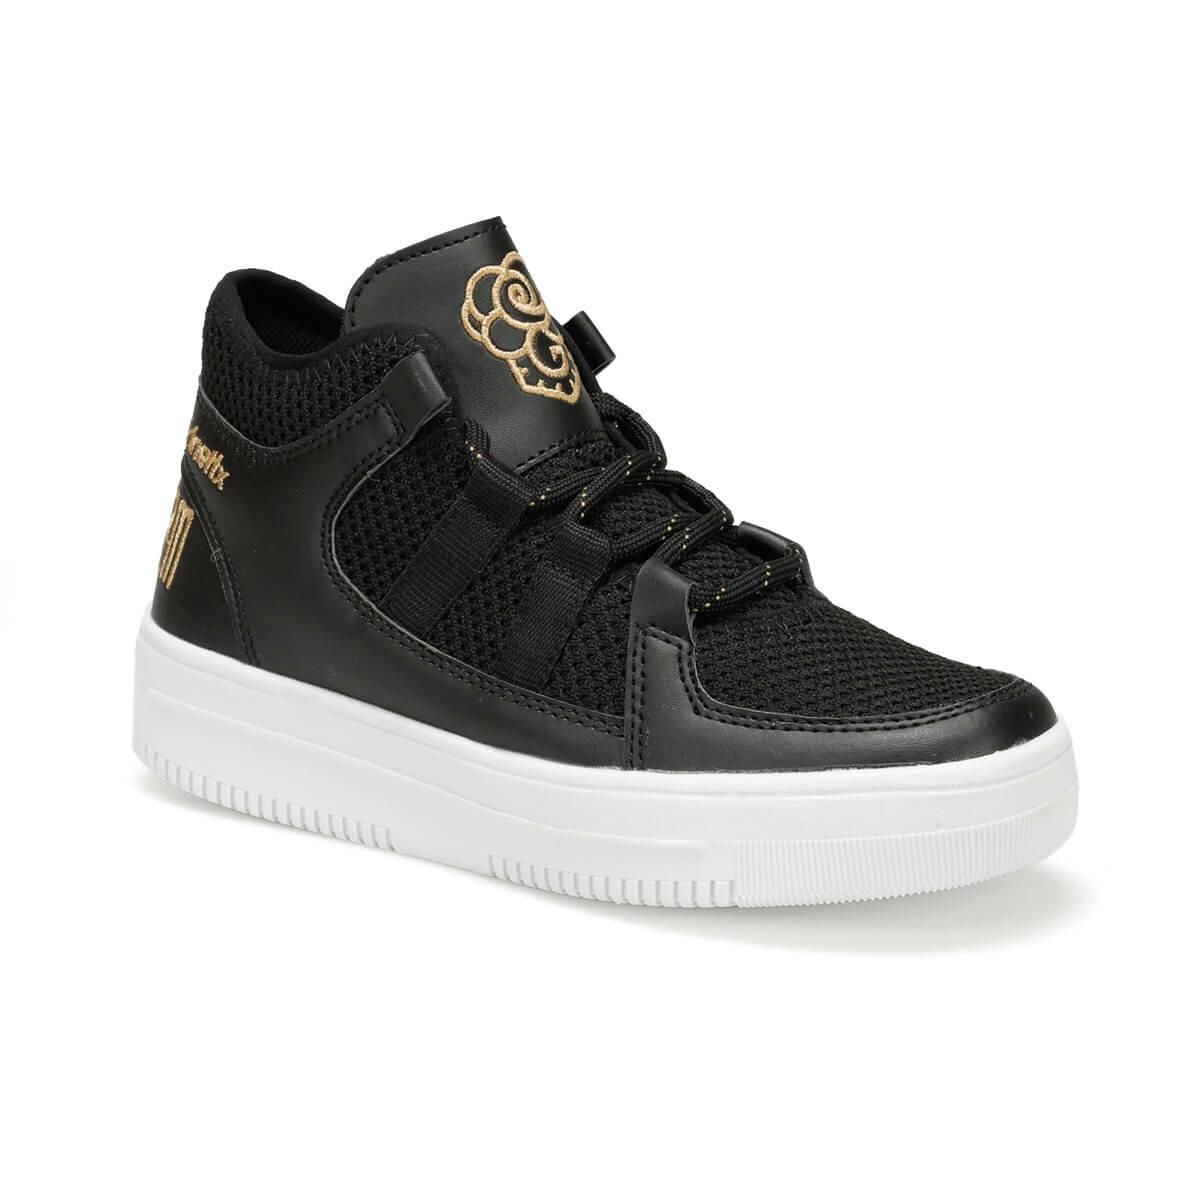 FLO GAZAPIZM Black Men 'S Sneaker Shoes KINETIX